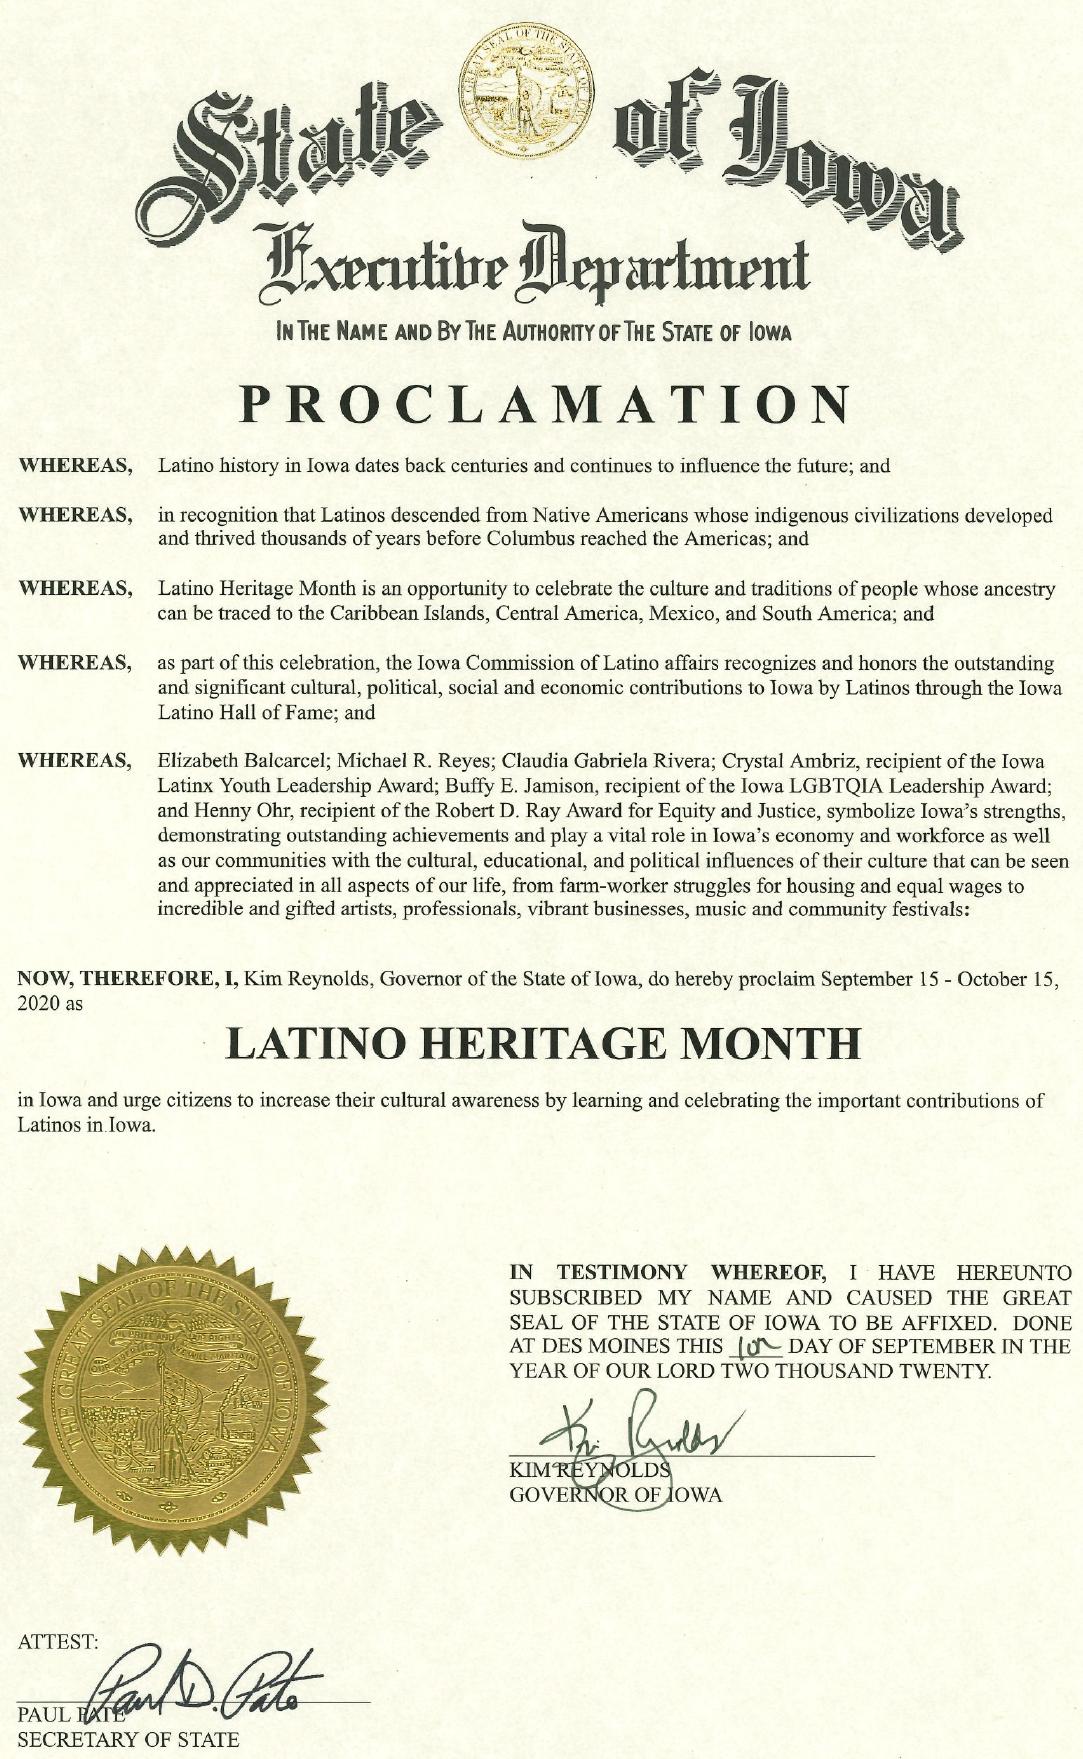 2020 Latino Heritage Month Proclamation